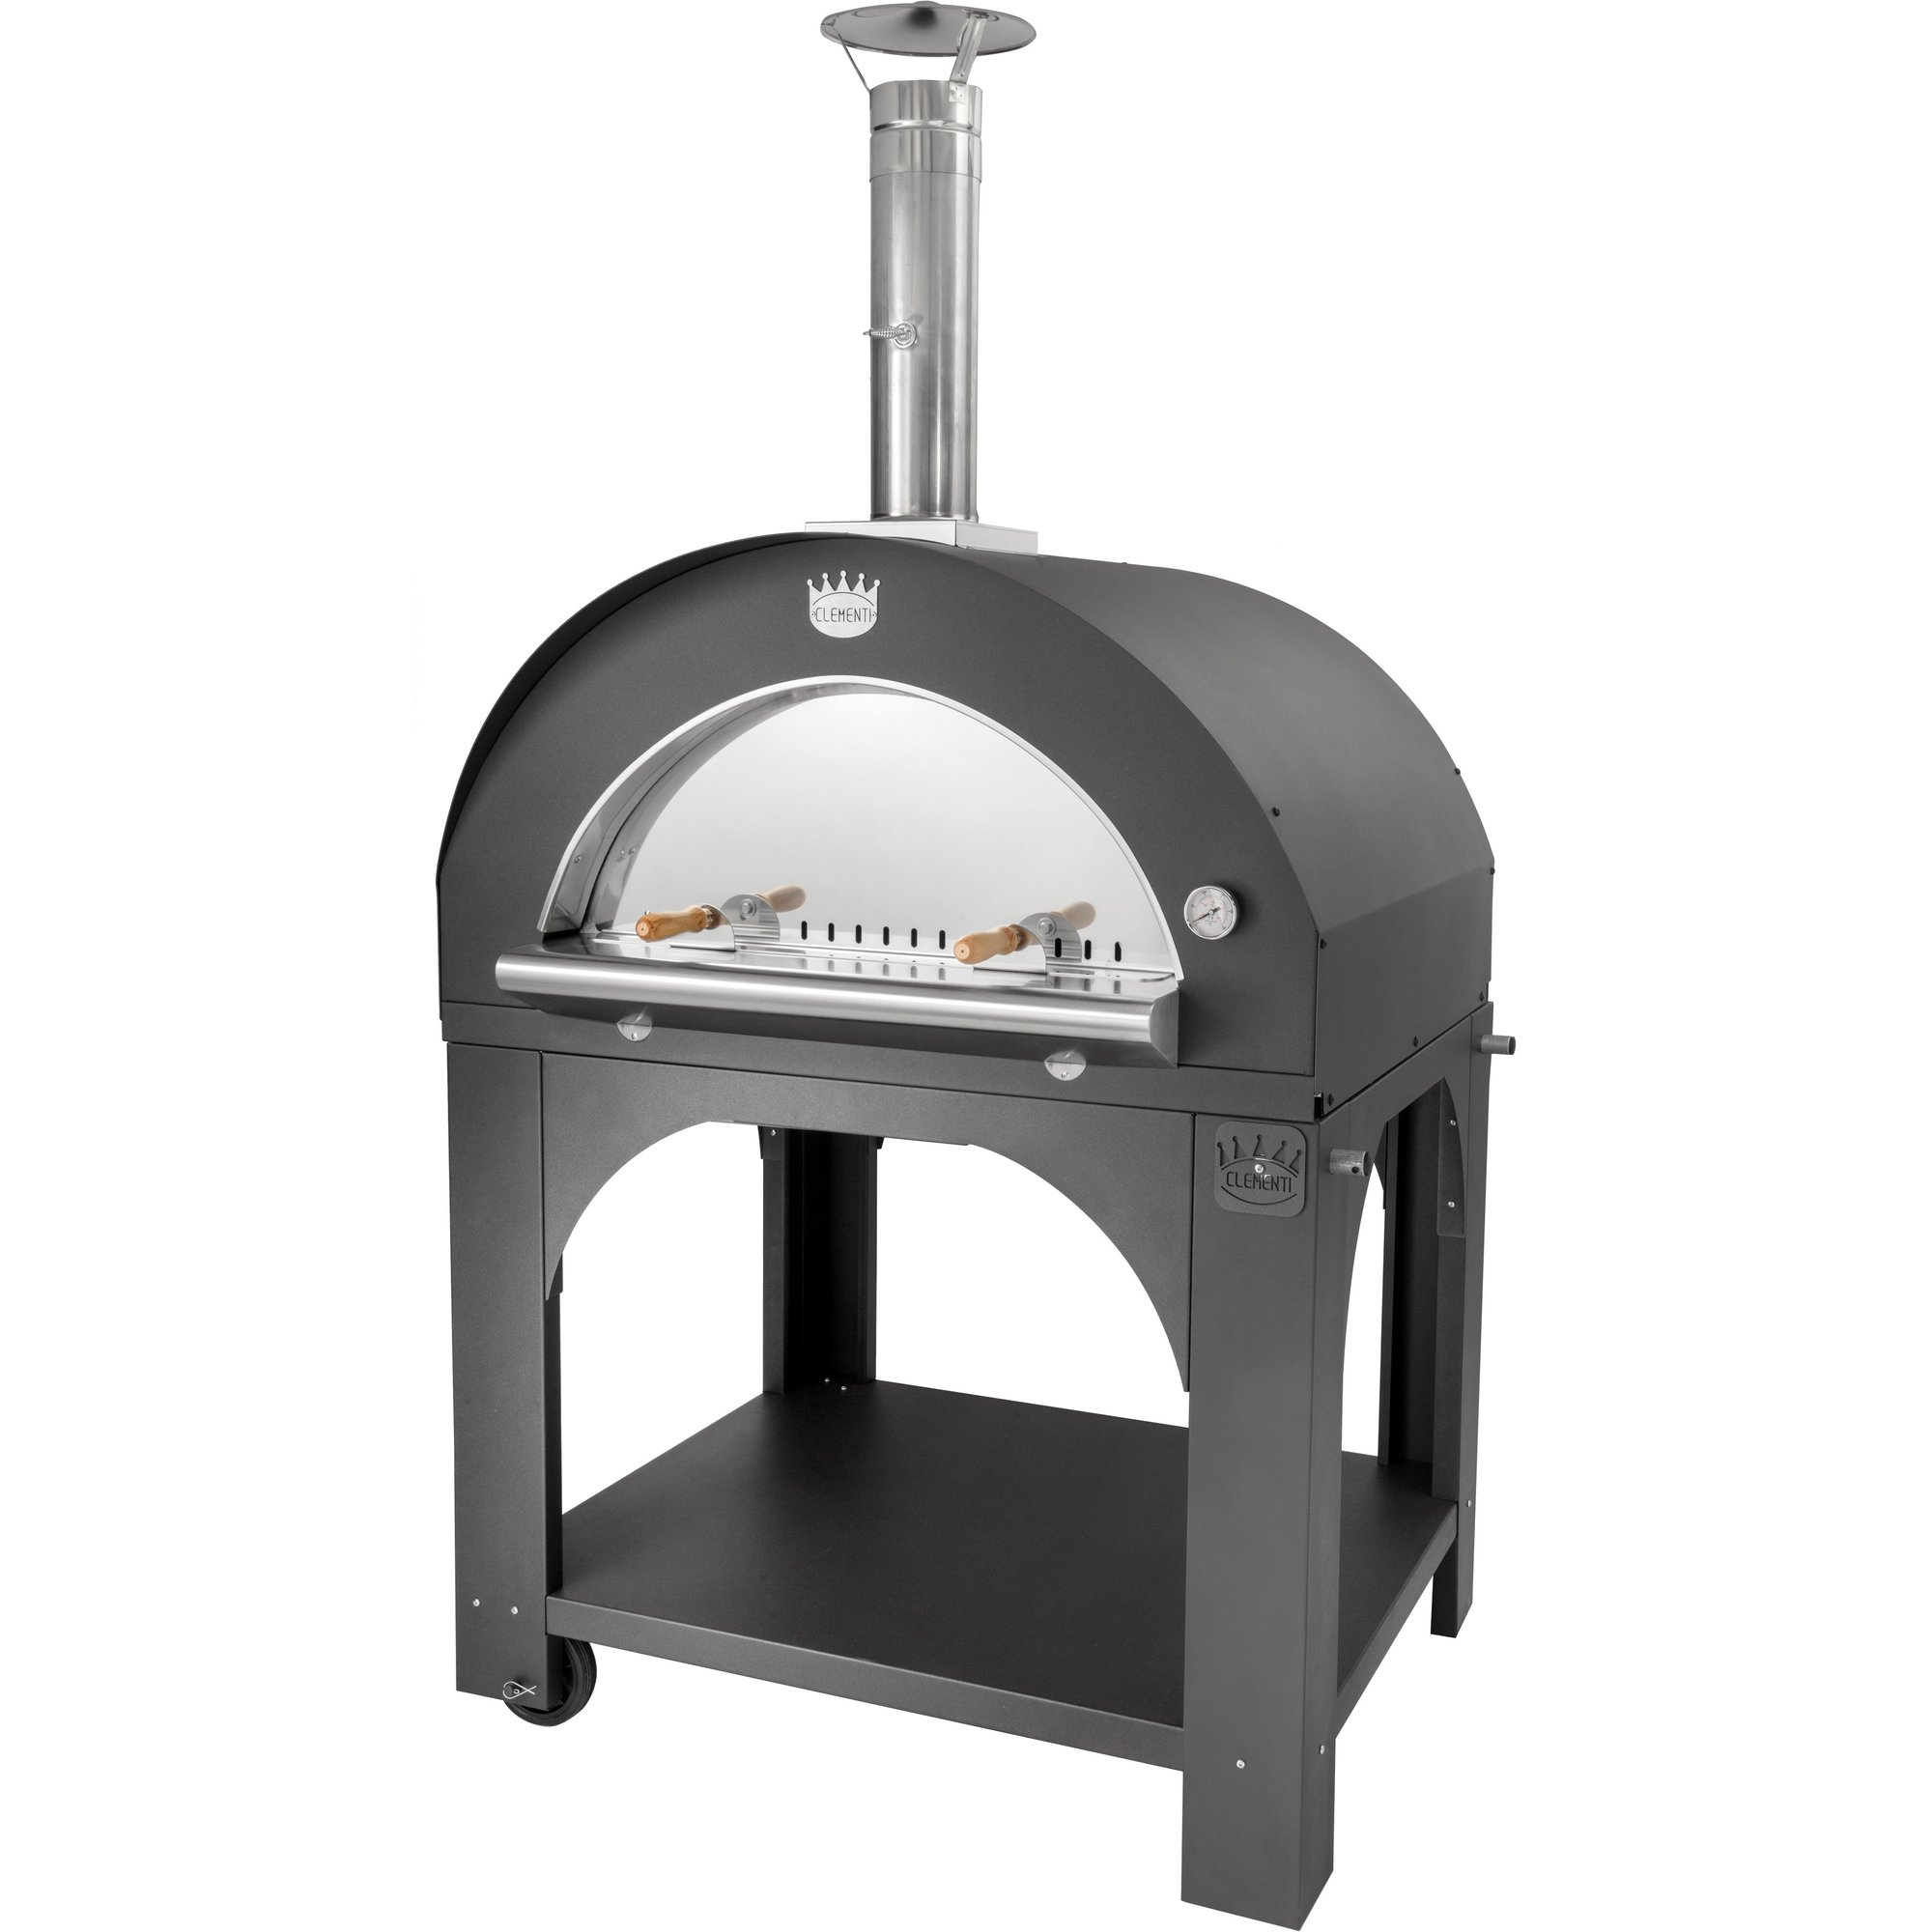 Clementi Pulcinella Vedeldad Pizzaugn 100×80 cm. Antracit